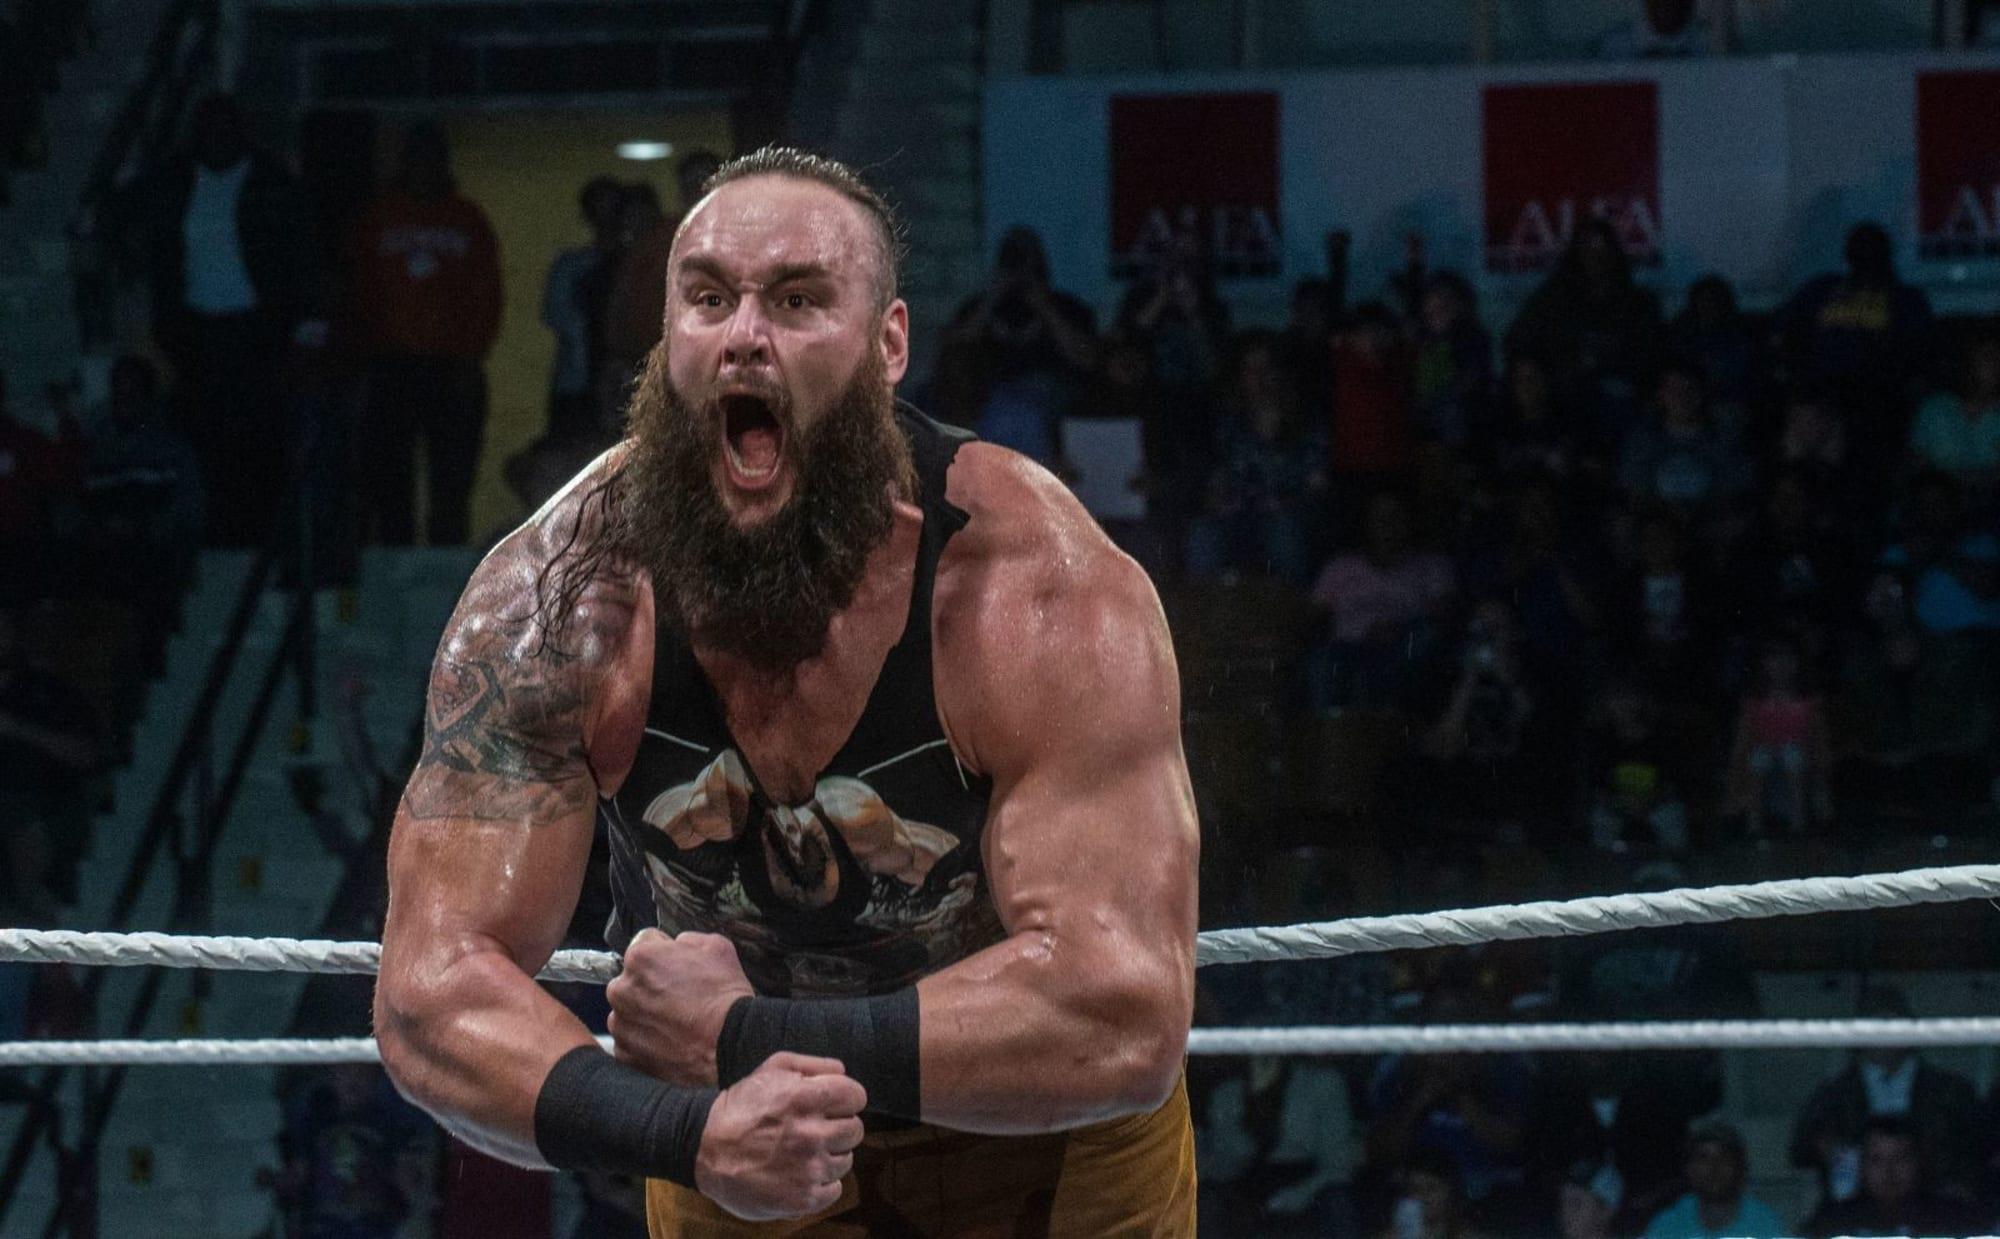 WWE Raw: Braun Strowman lays out Drew McIntyre and Bobby Lashley